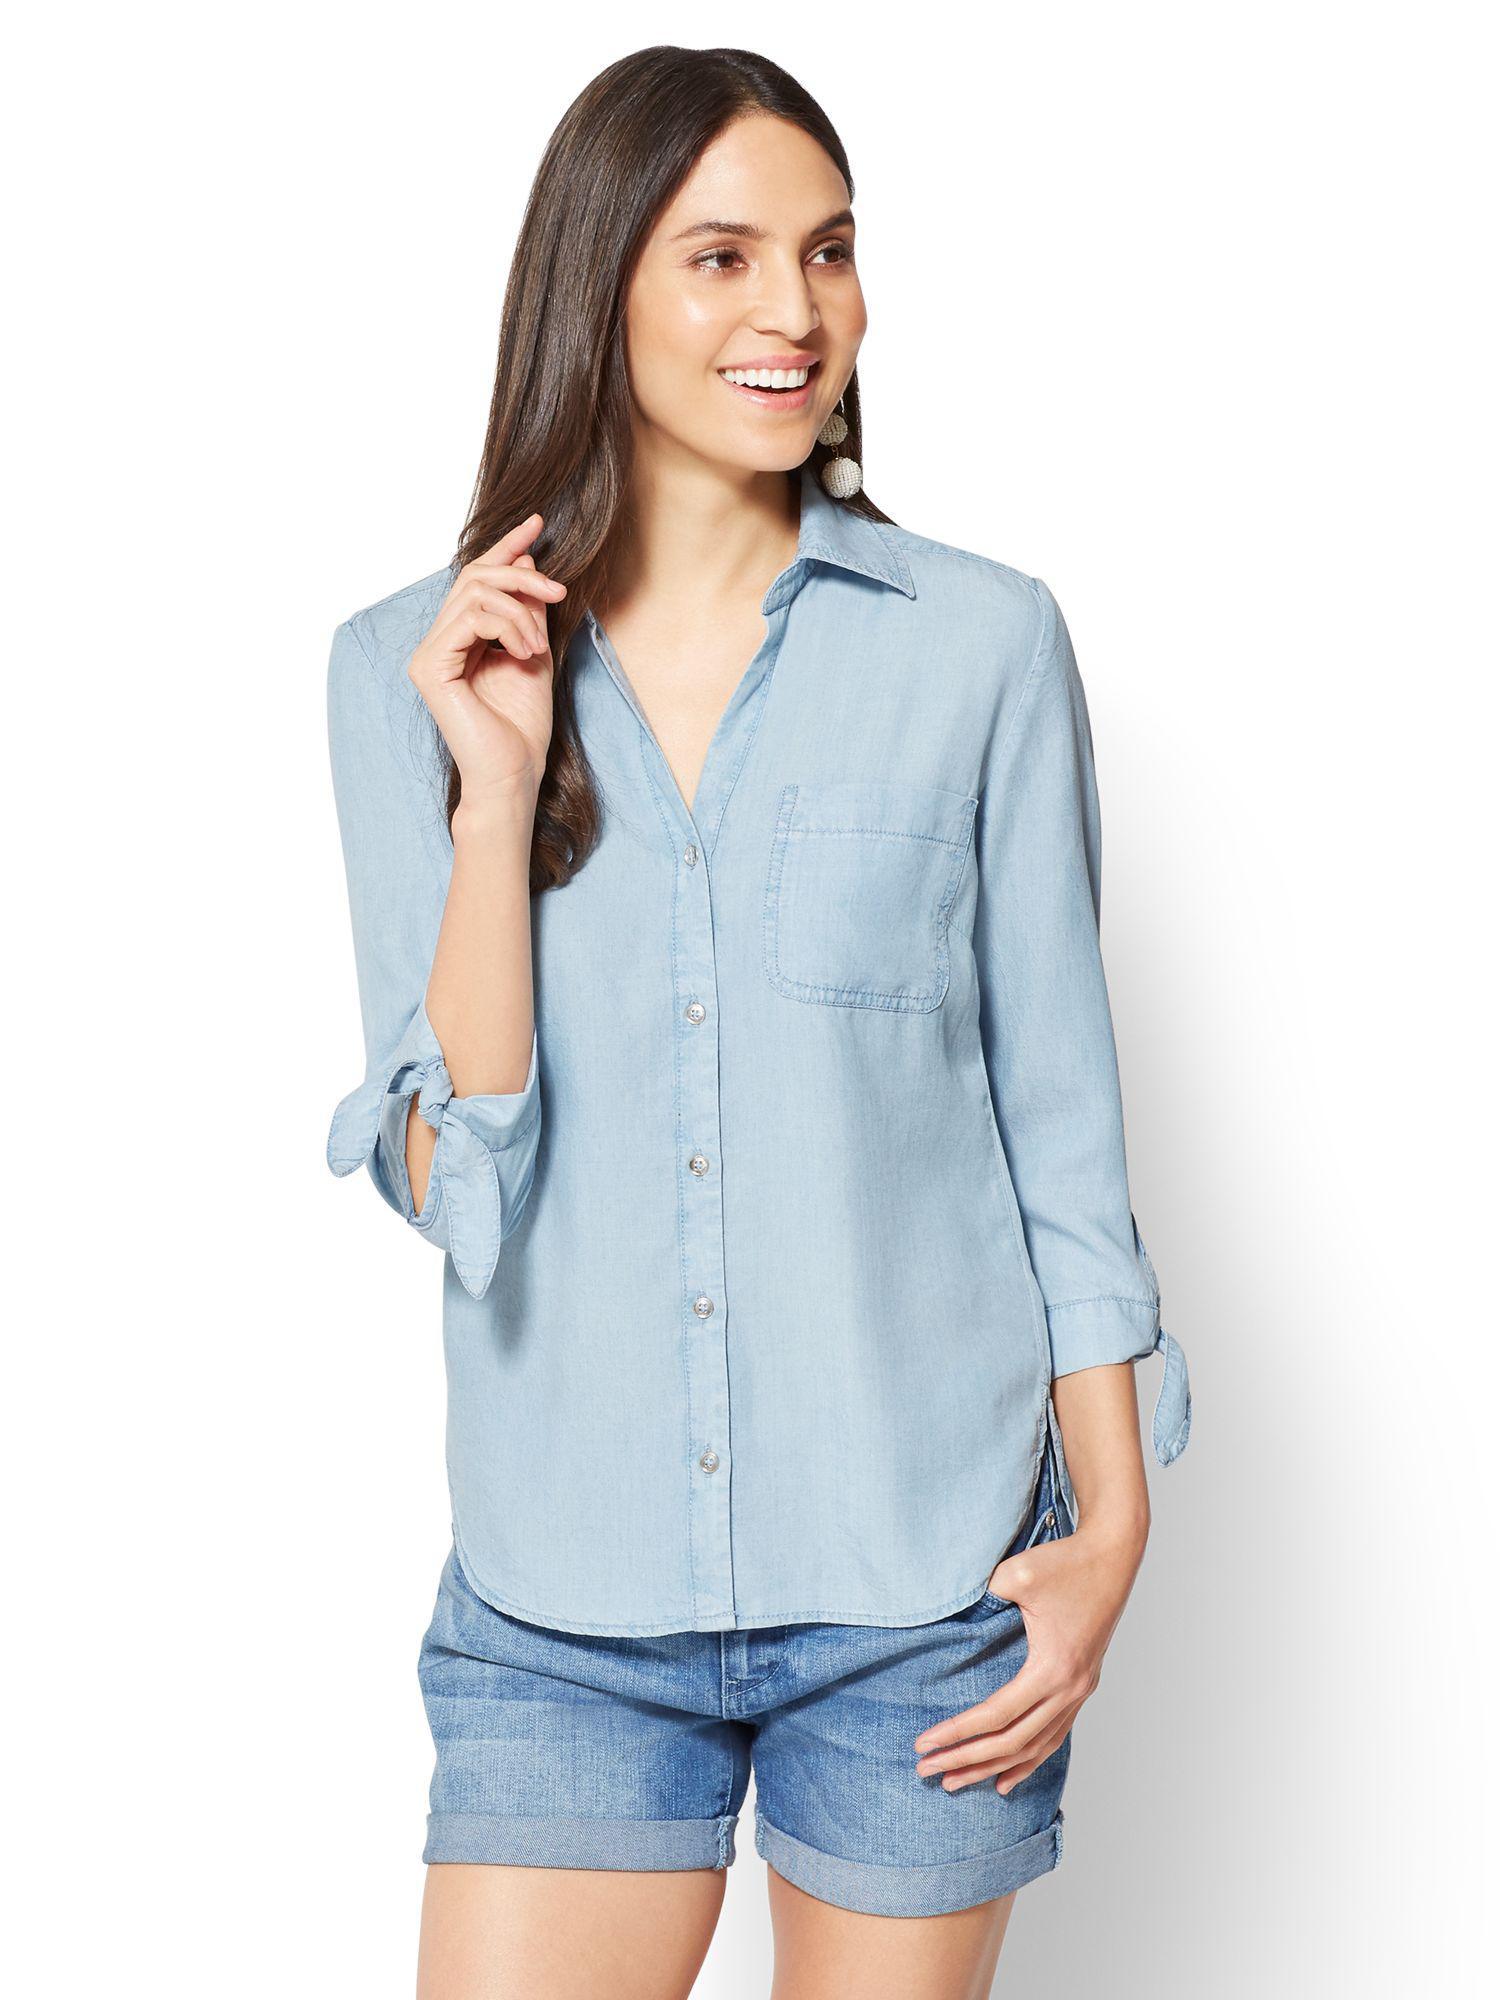 b4e4530b084 New York   Company Soho Soft Shirt - Ultra-soft Chambray in Blue - Lyst